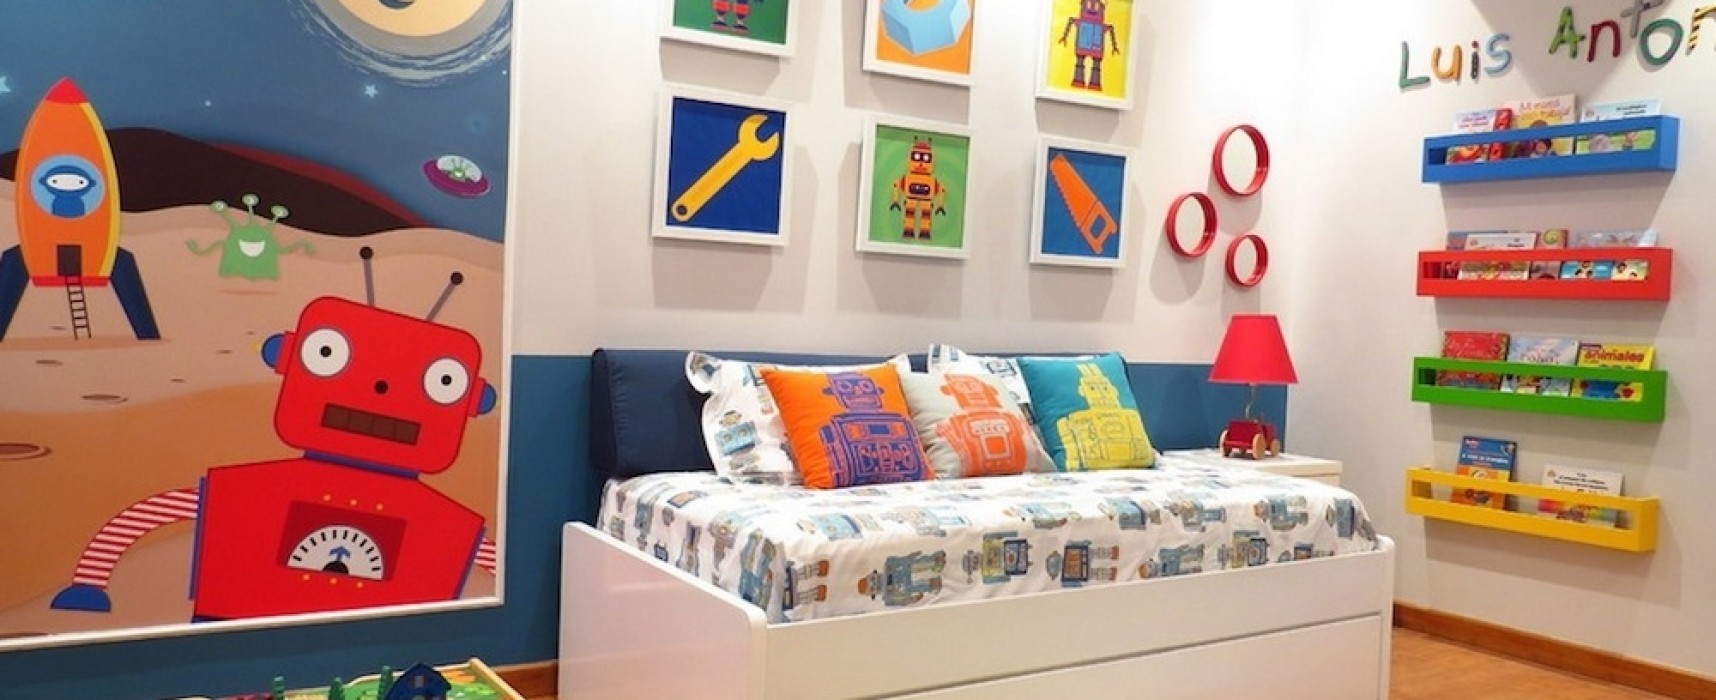 تصاميم غرف أطفال تنموا معهم